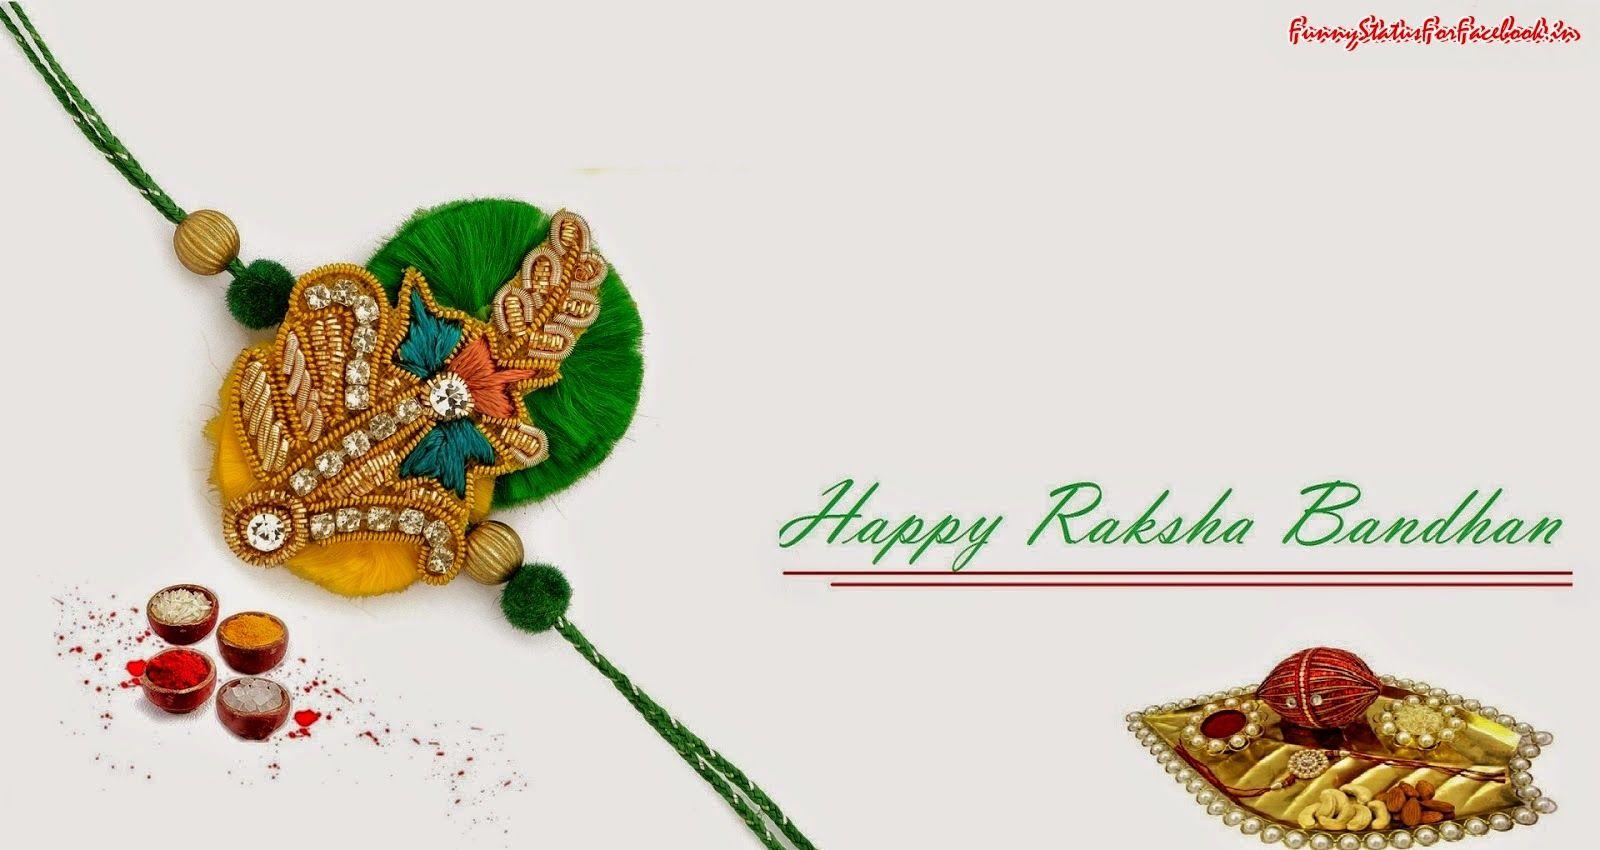 Happy Raksha Bandhan Hd Wallpapers Images By Funnystatusforface